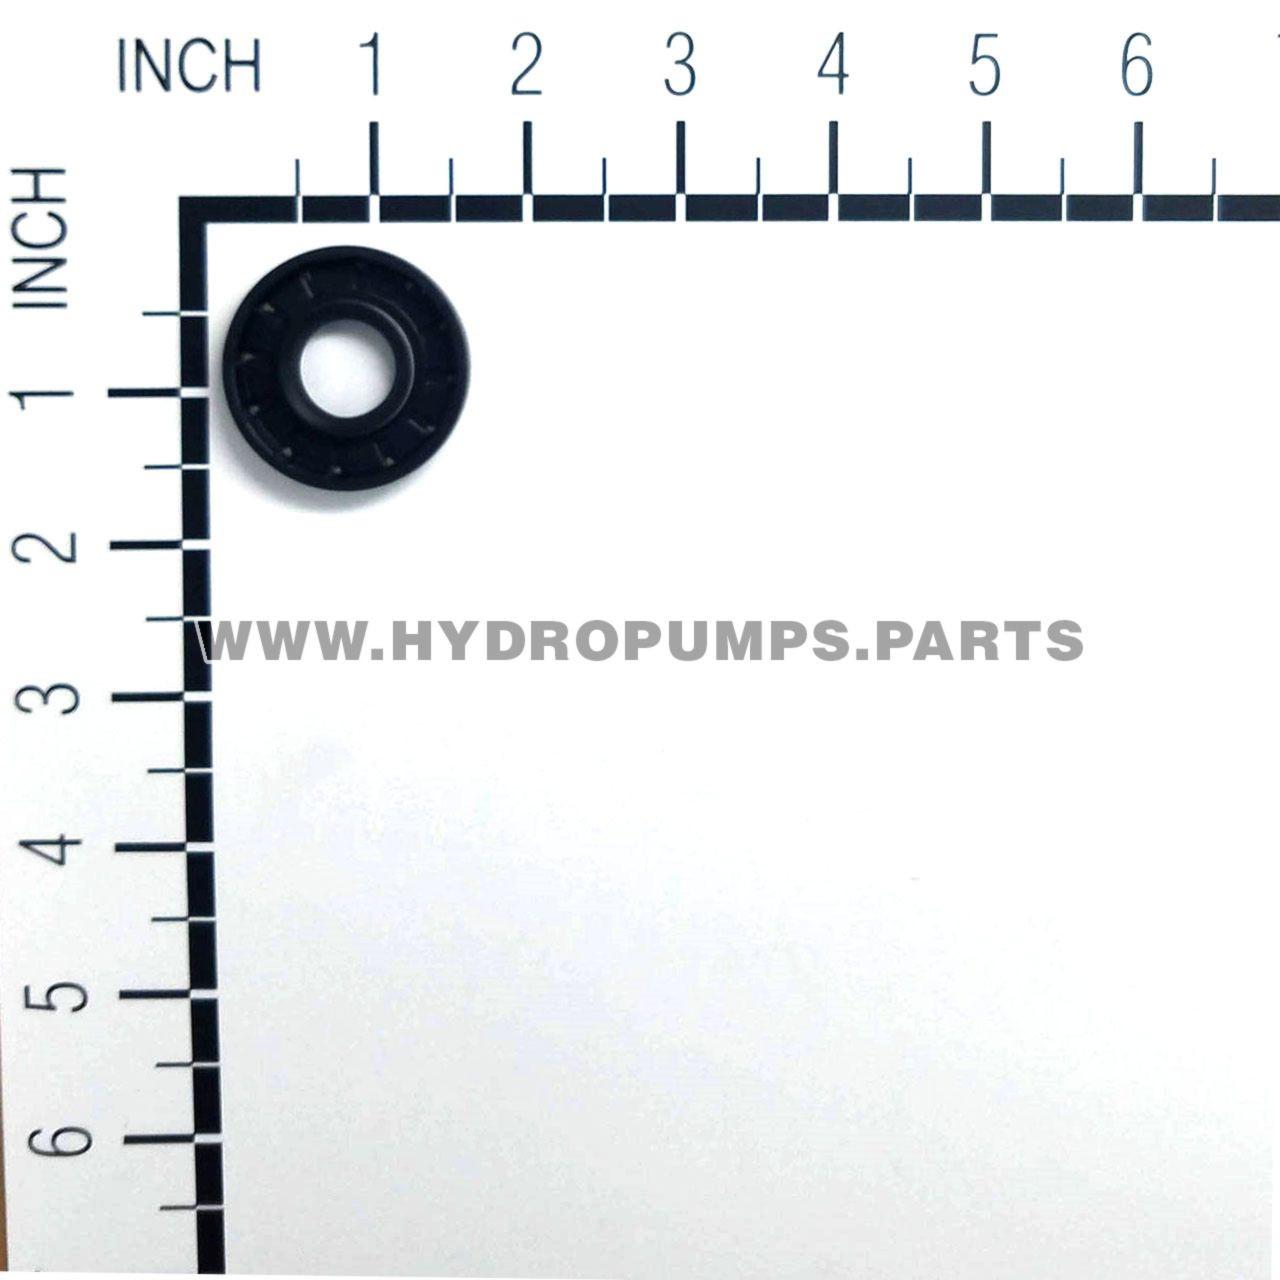 Hydro Gear 51161 - Seal 17 X 40 X 7 Lip - Image 3